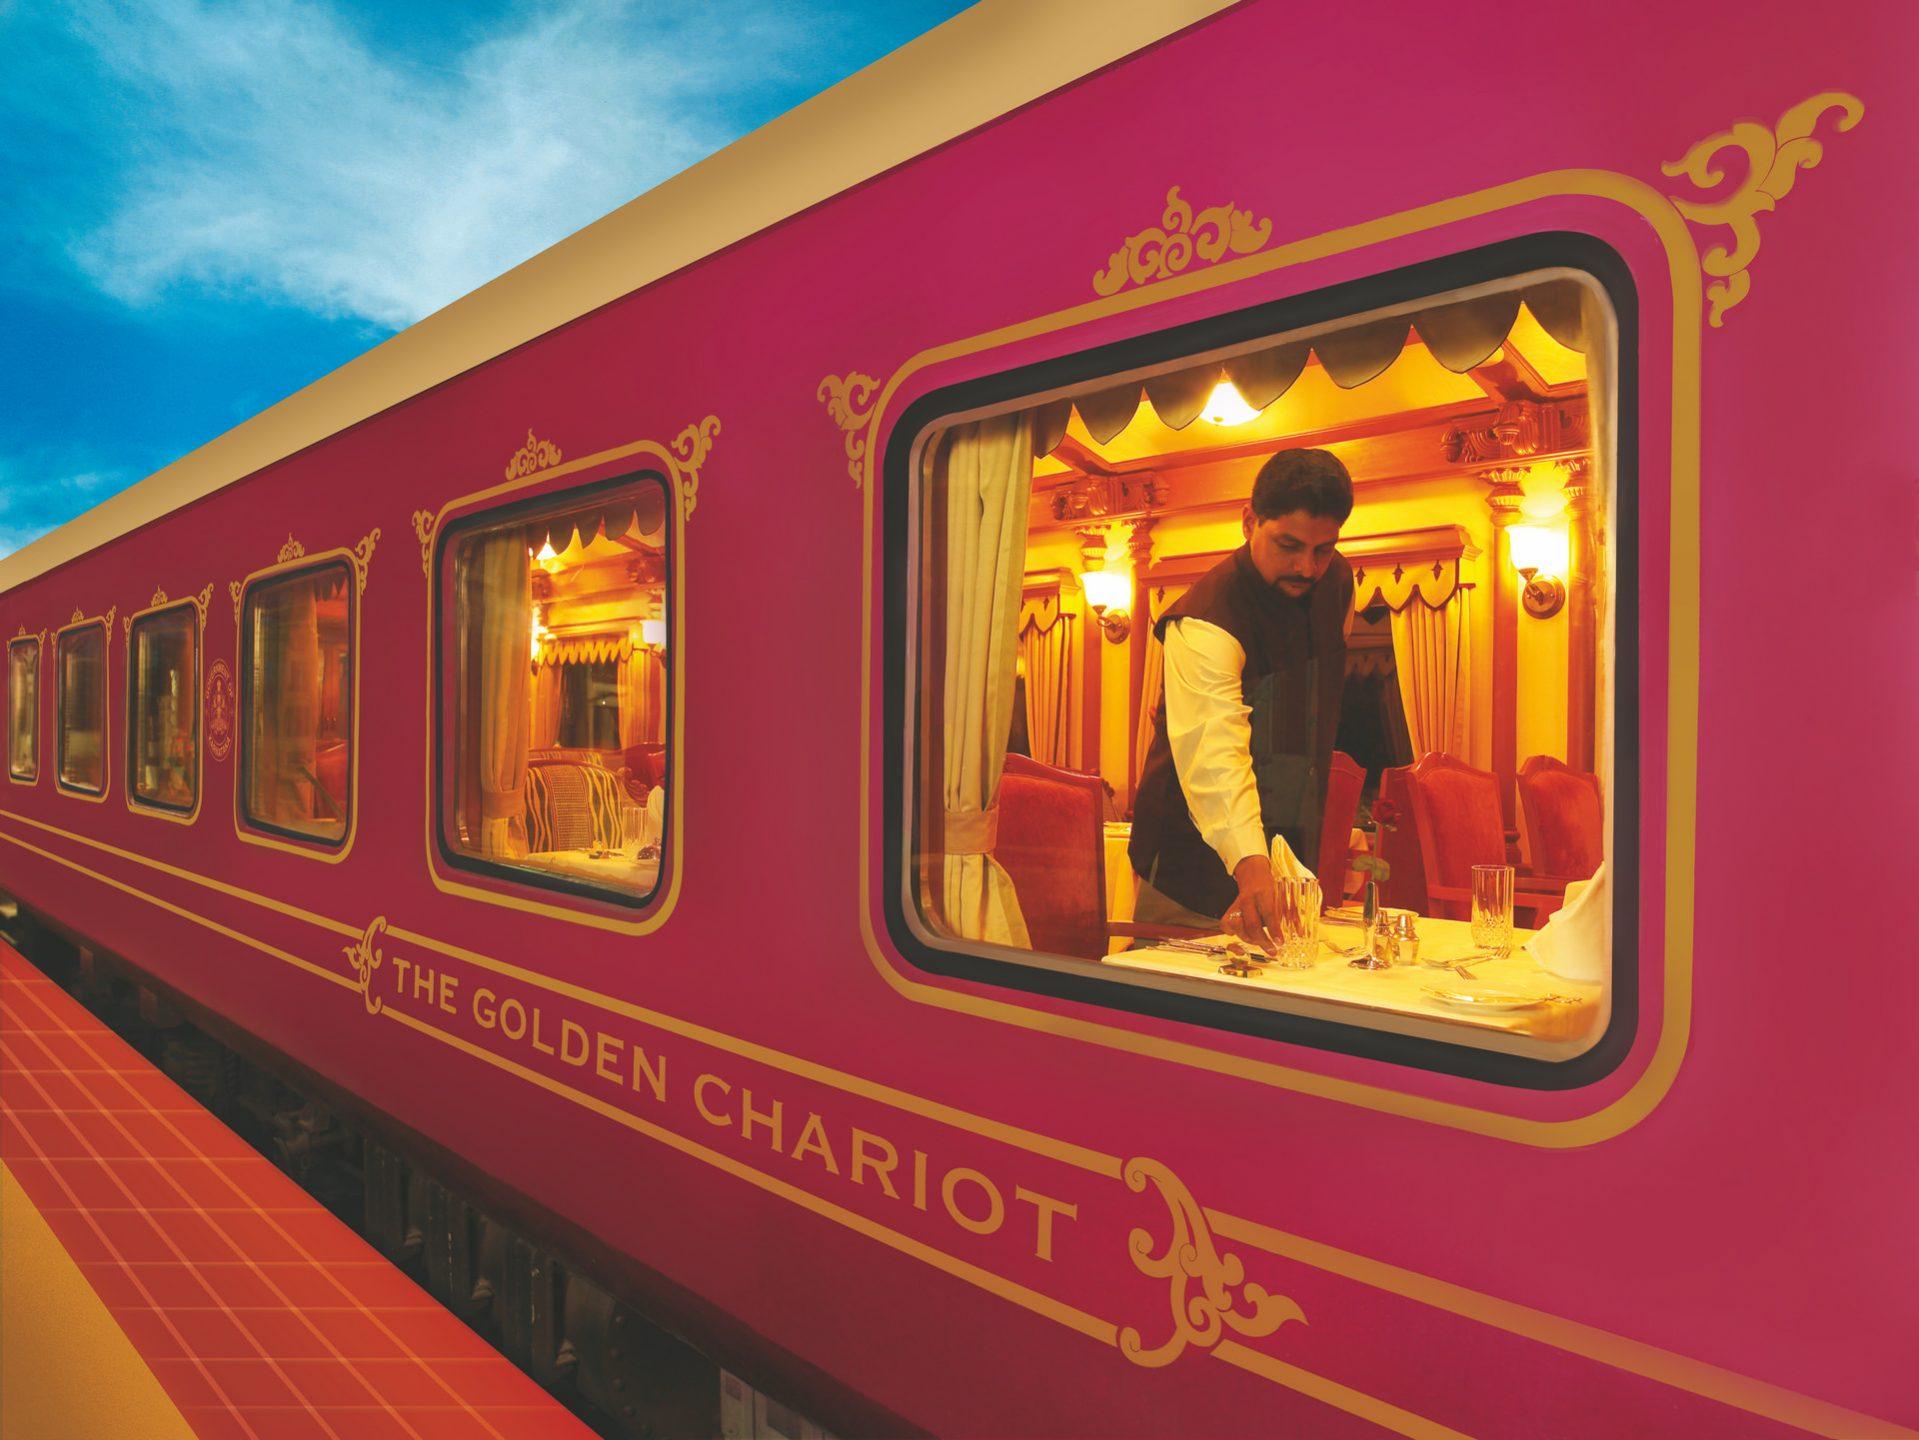 NOMAD-luksusowe-pociągi-Golden-Chariot-Indie-02-1